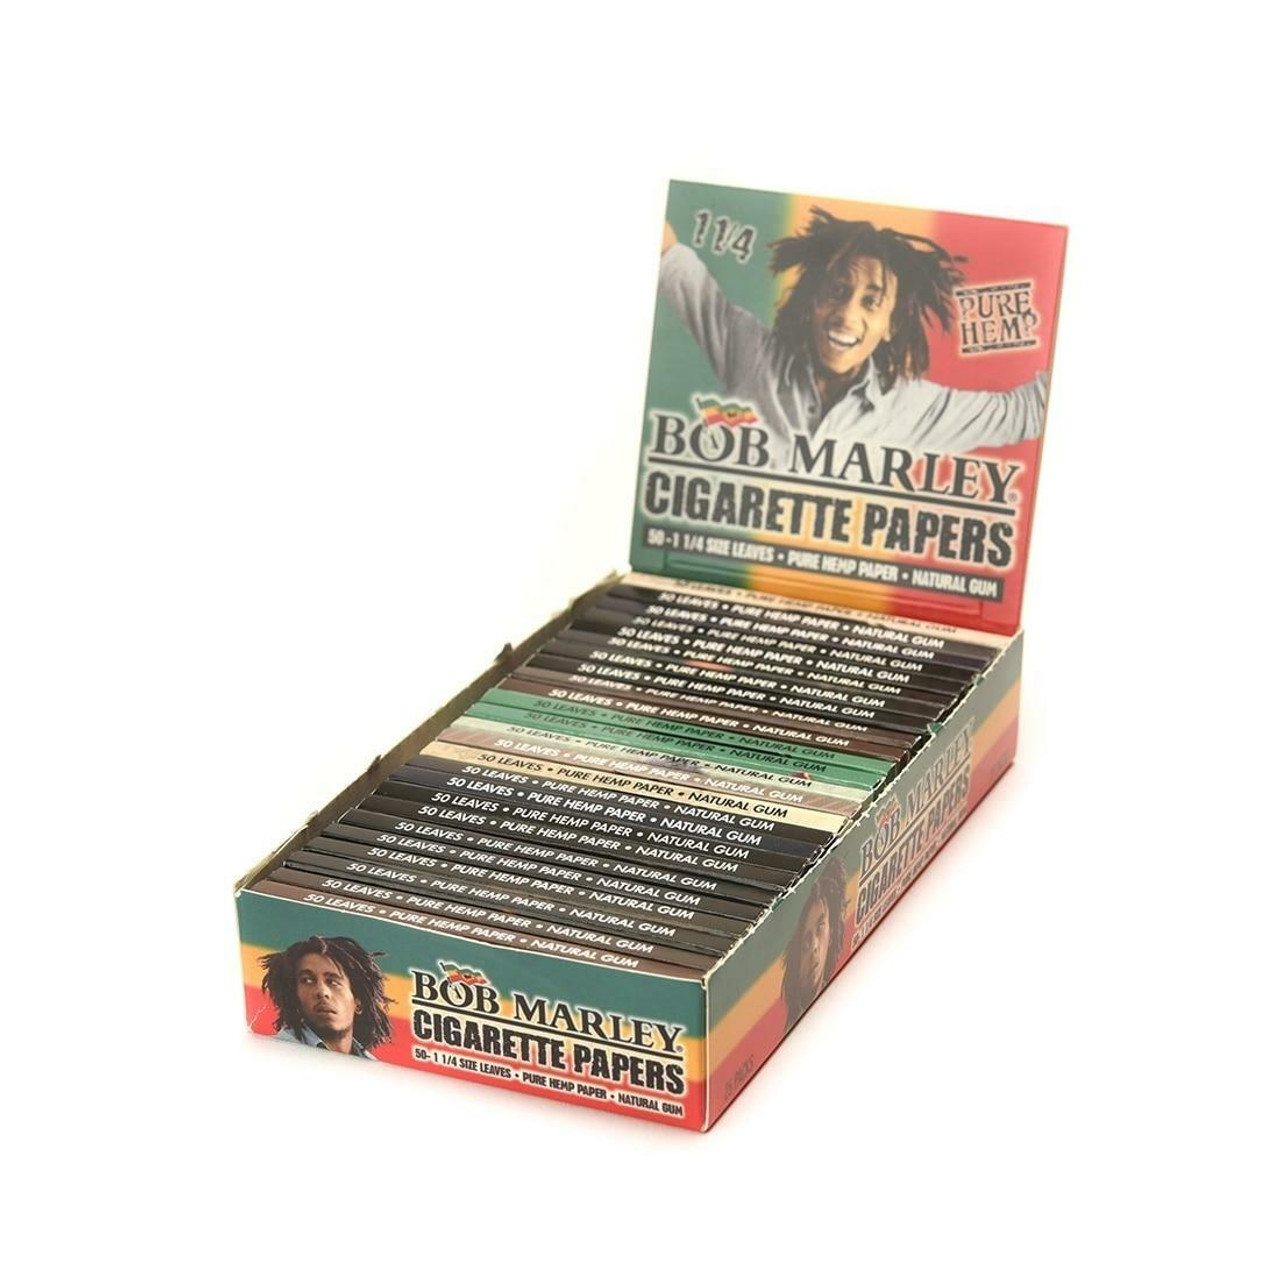 Bob Marley Bob Marley Pure Hemp Original Rolling Papers 1 1/4 1.25 at The Cloud Supply